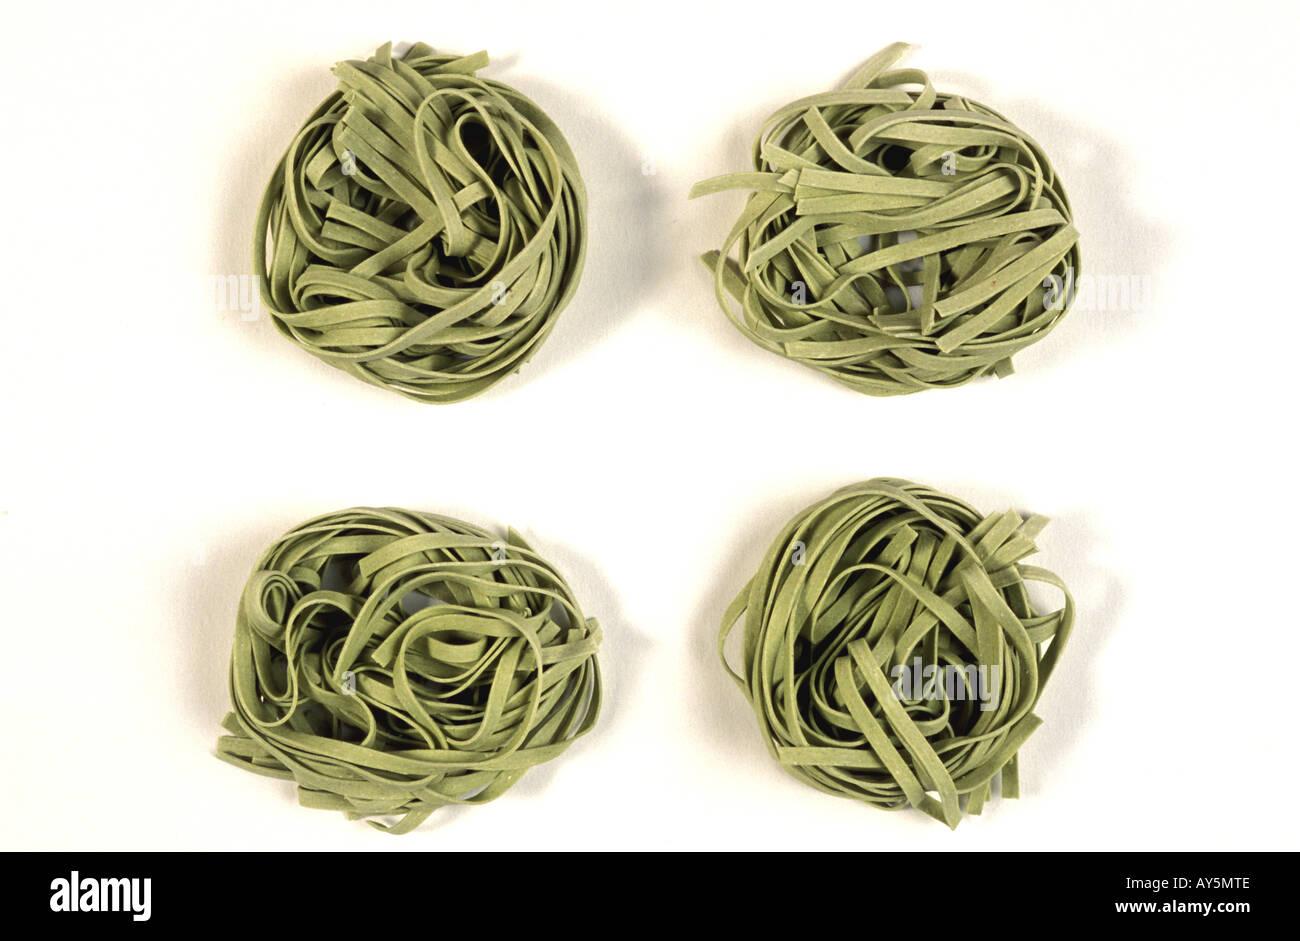 Pasta Spinach Pasta - Stock Image